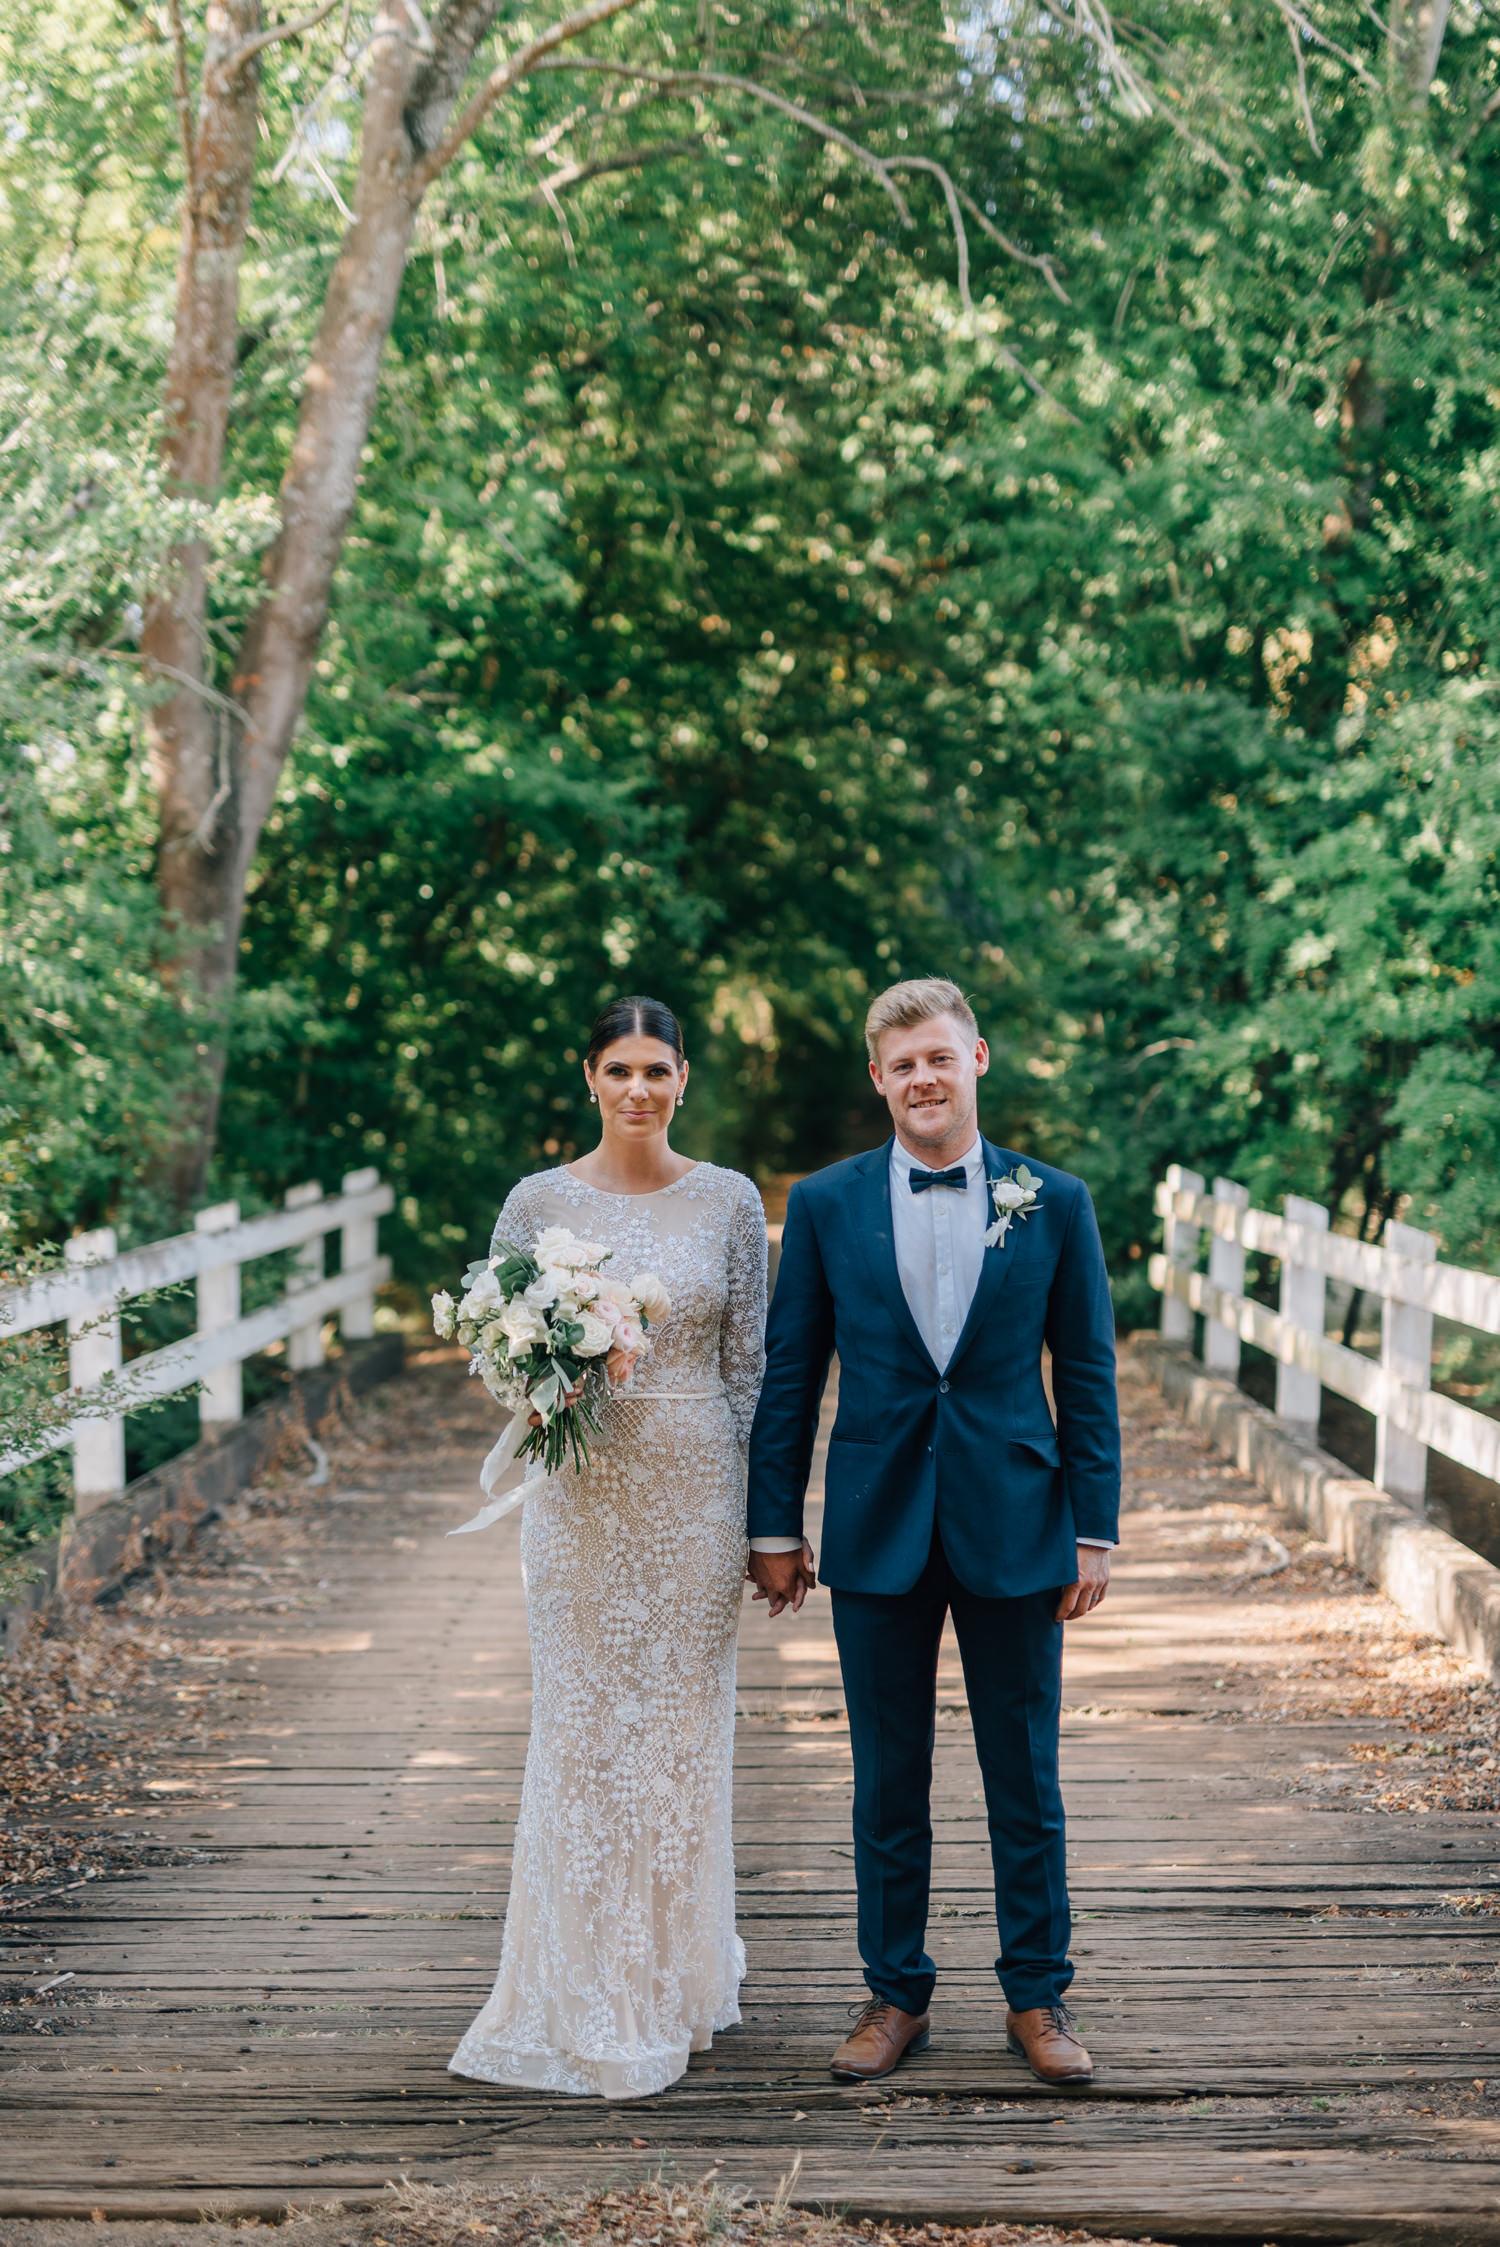 Quamby-Wedding-Photography-112.jpg